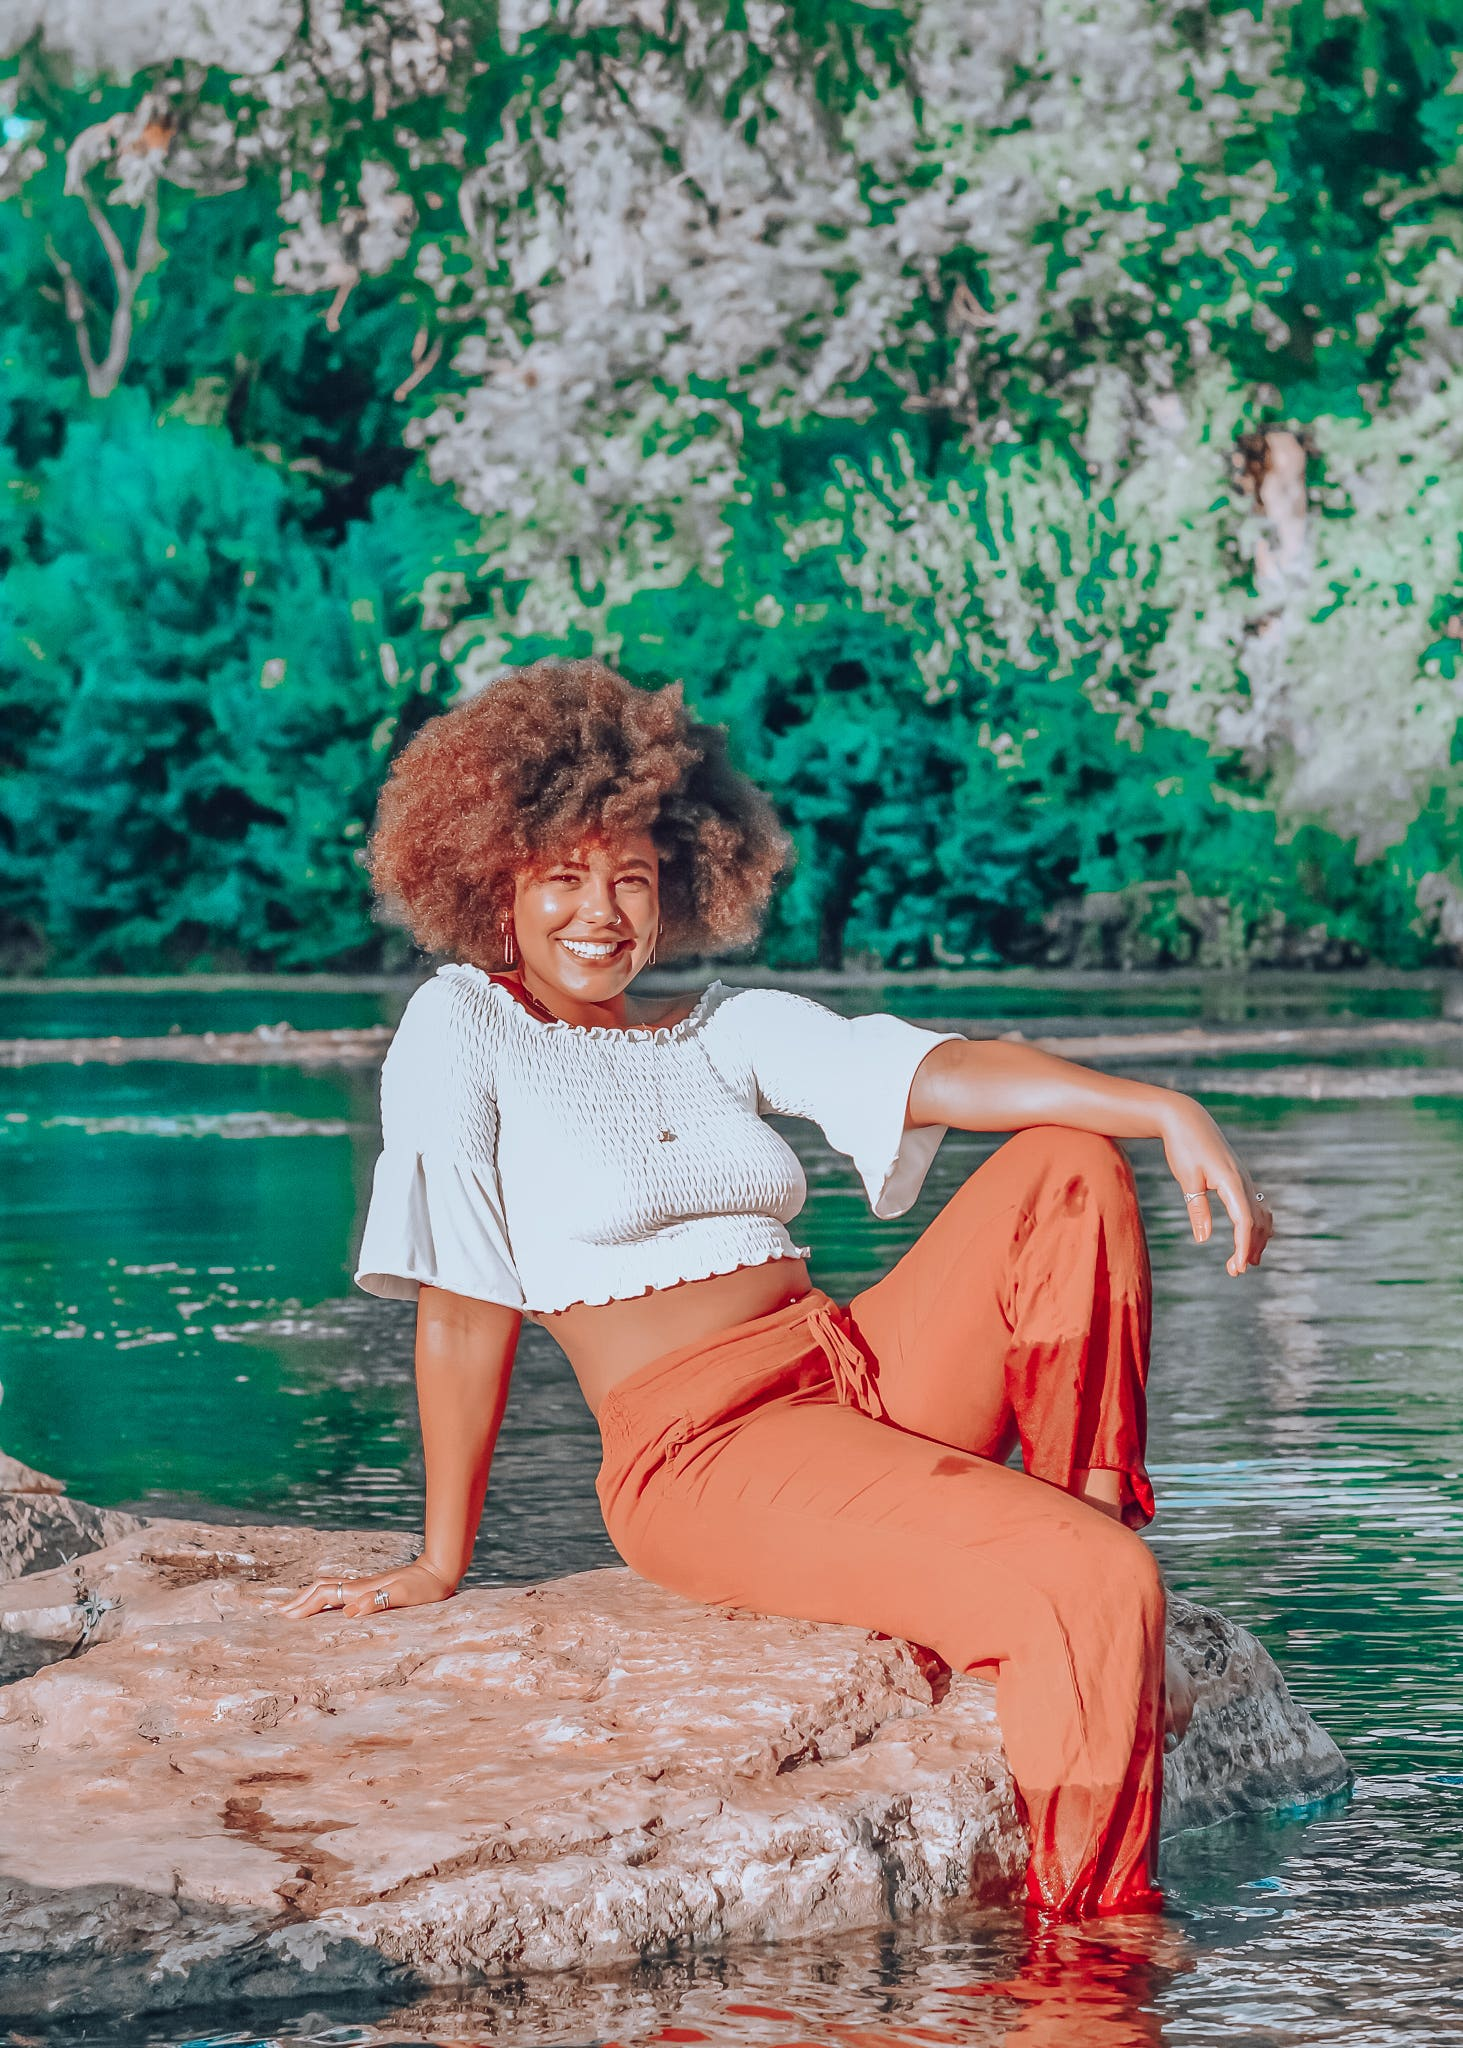 Pretty Girl in the Blue River